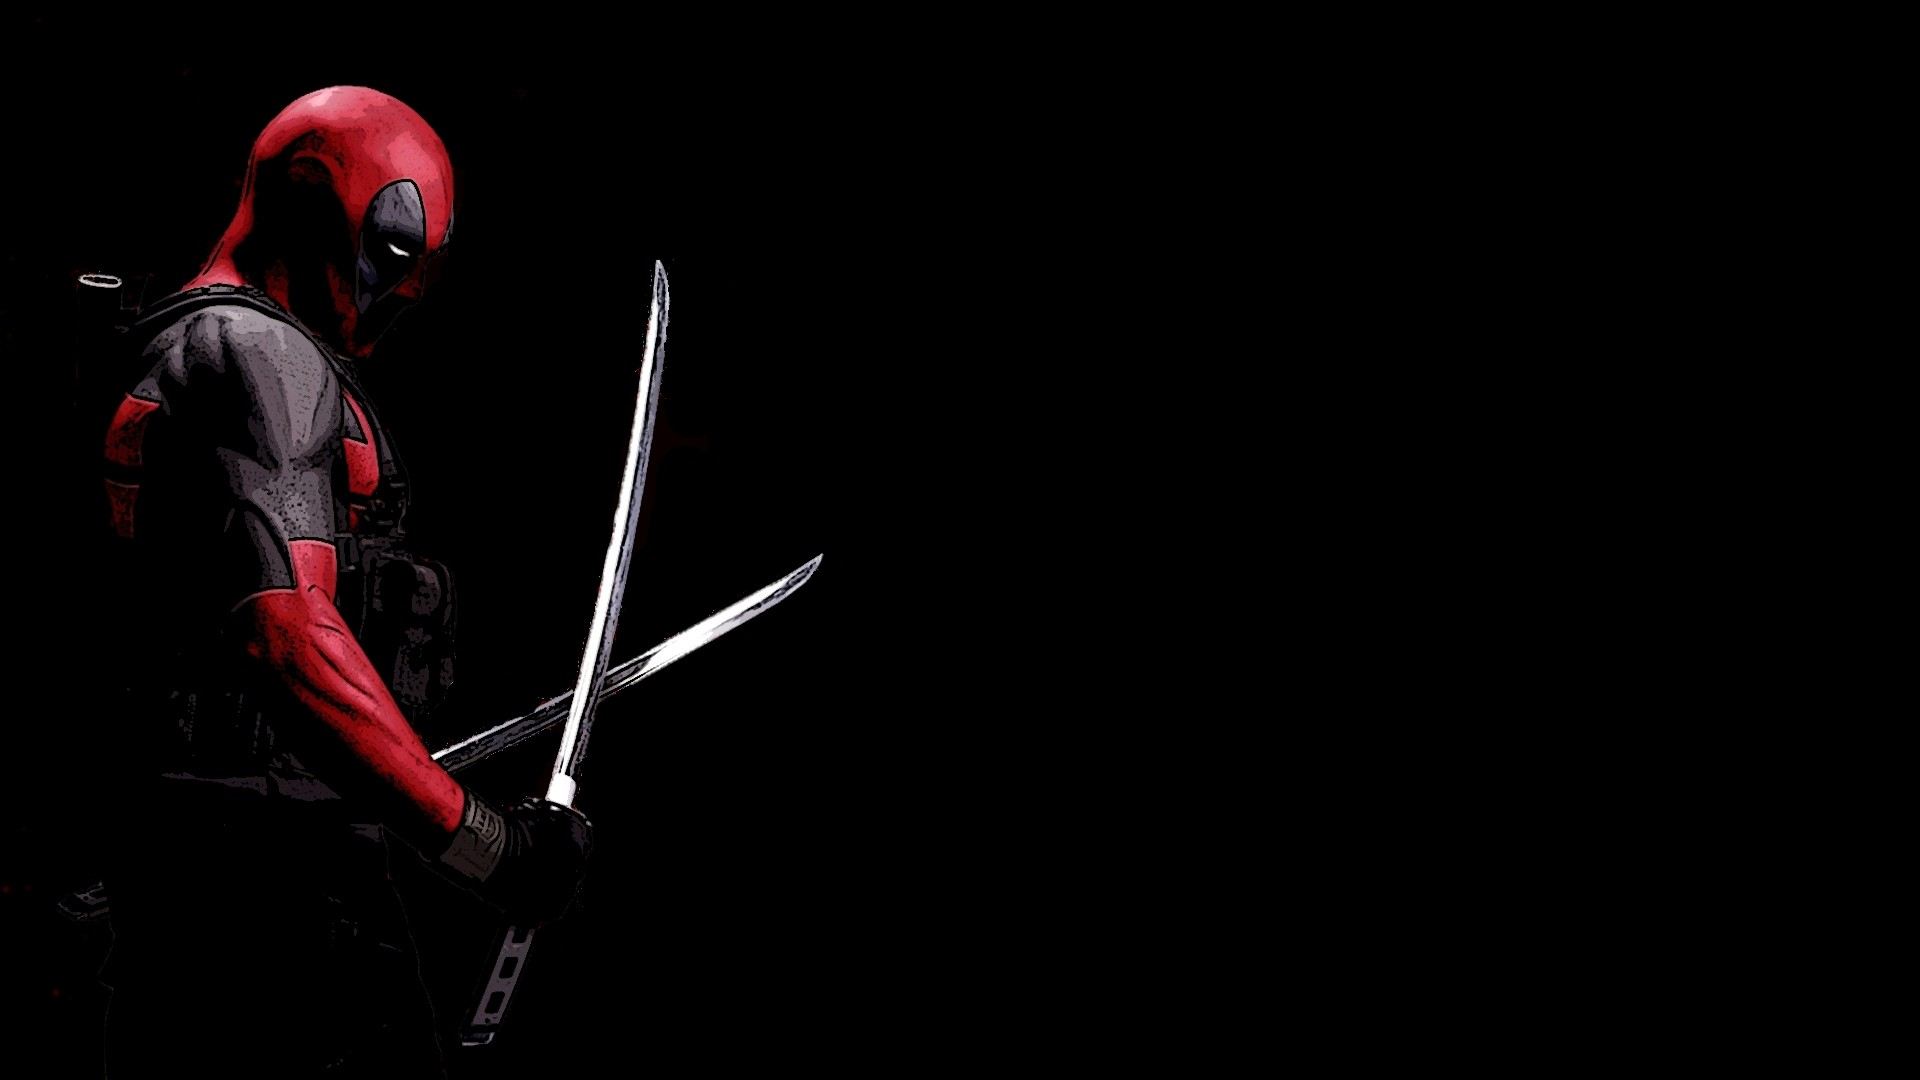 Deadpool Hd Wallpaper Download Free Cool Backgrounds For Desktop